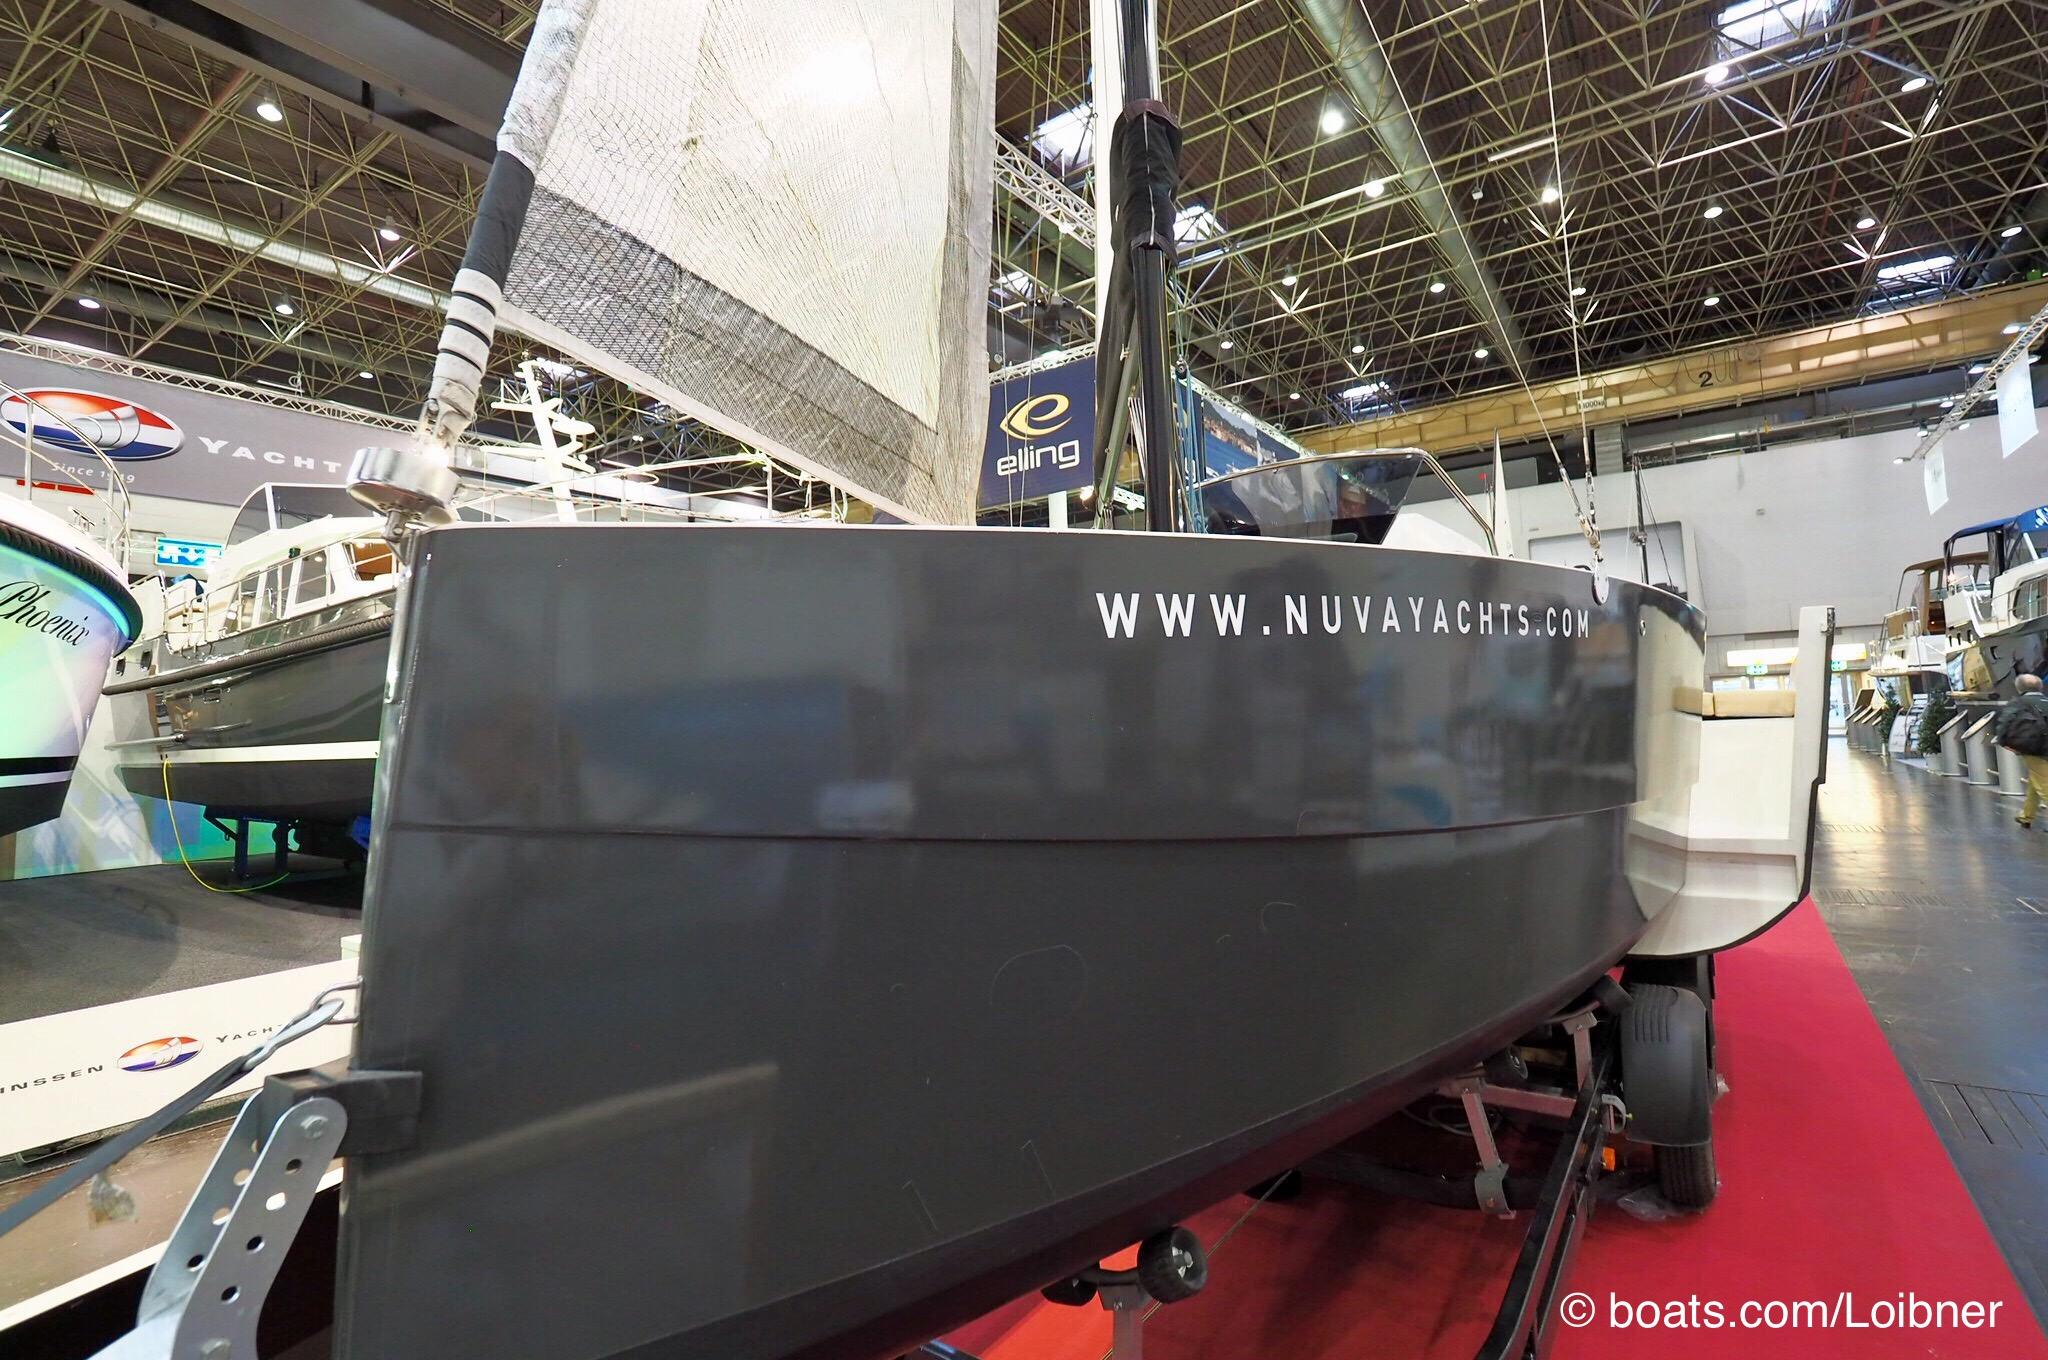 Nuva MS 6 mit ausgefahrenem Achtercockpit Foto: boats.com/Loibner